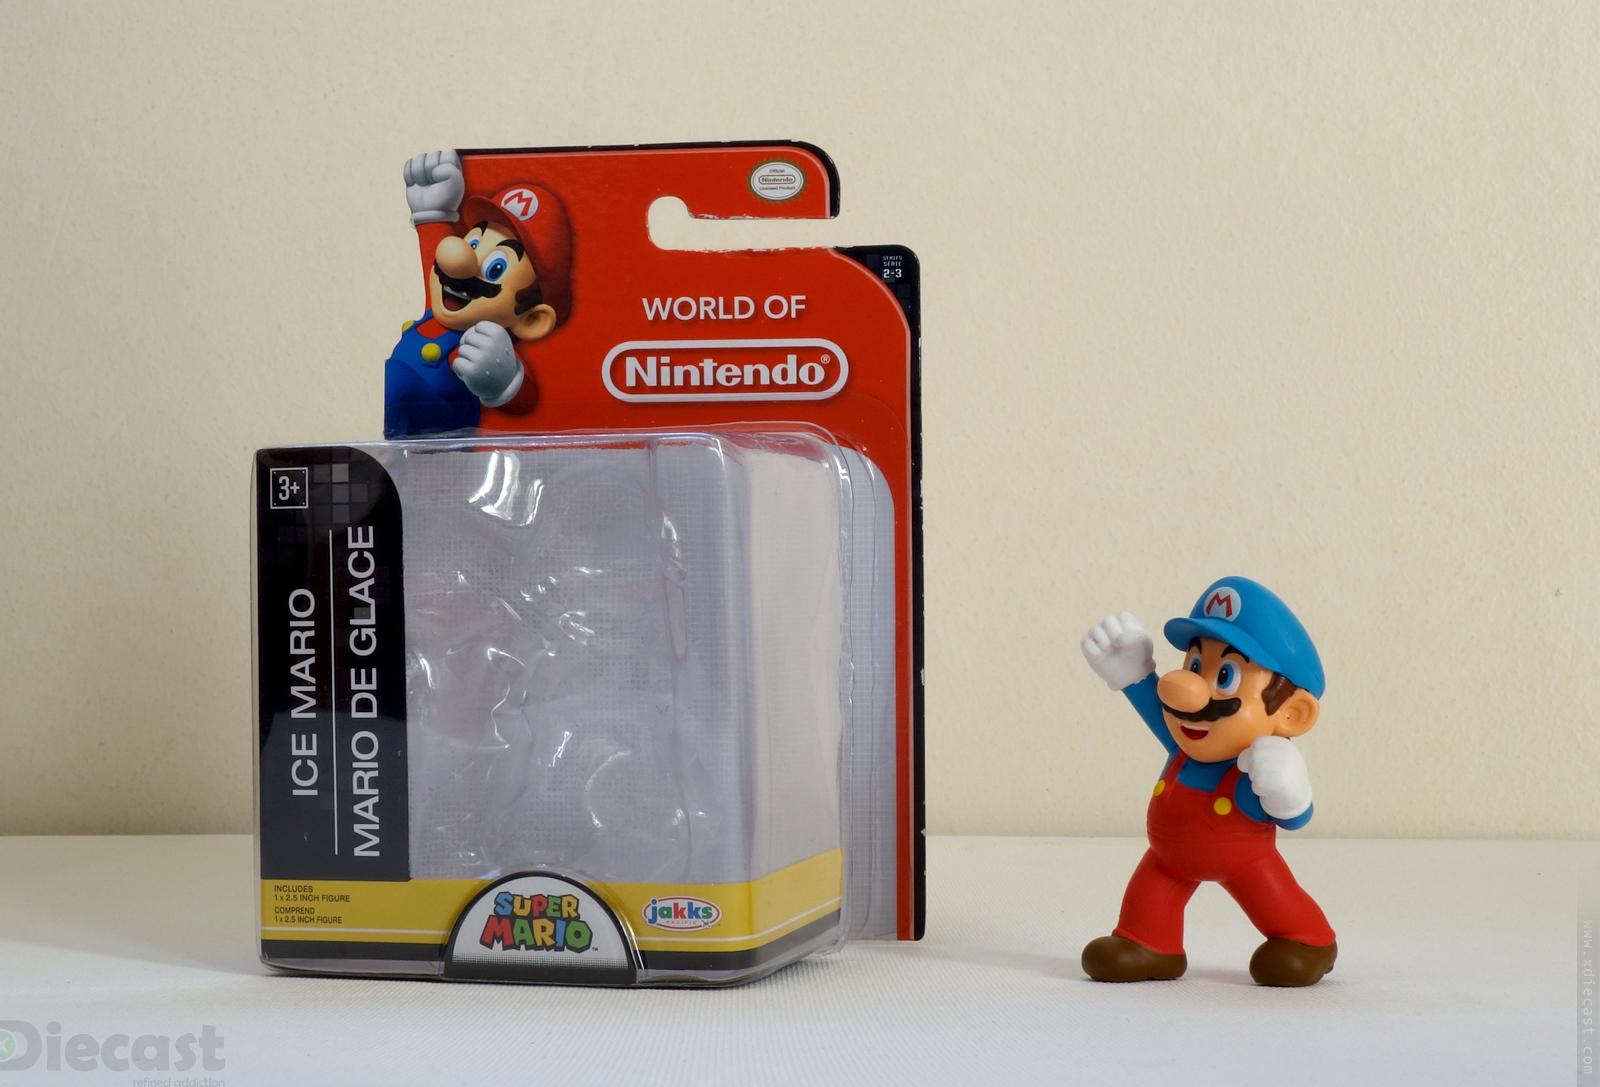 Nintendo Ice Mario - Unboxing